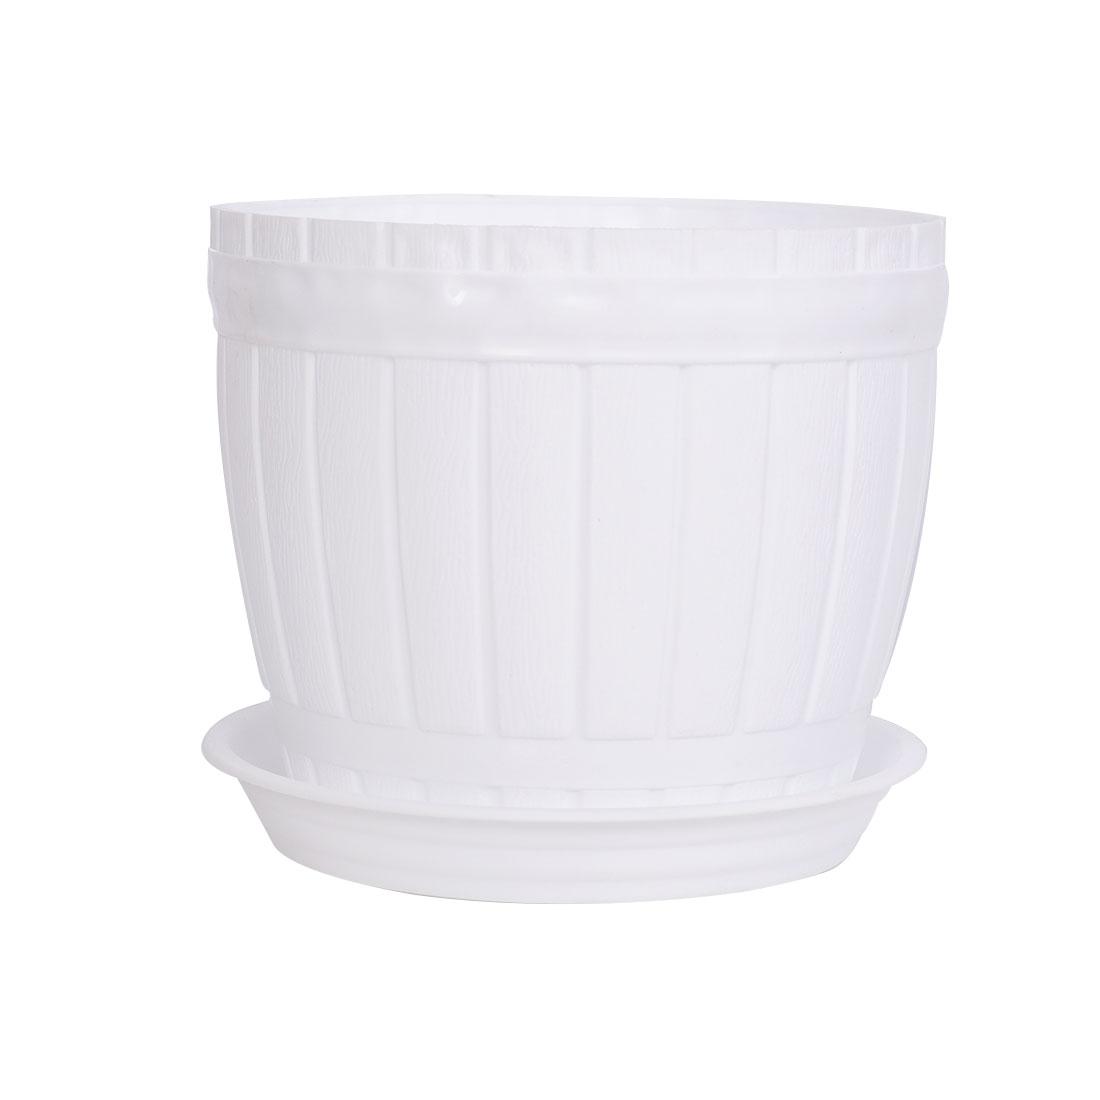 Balcony Garden Hotel Plastic Barrel Shape Plant Flower Pot Holder White w Tray